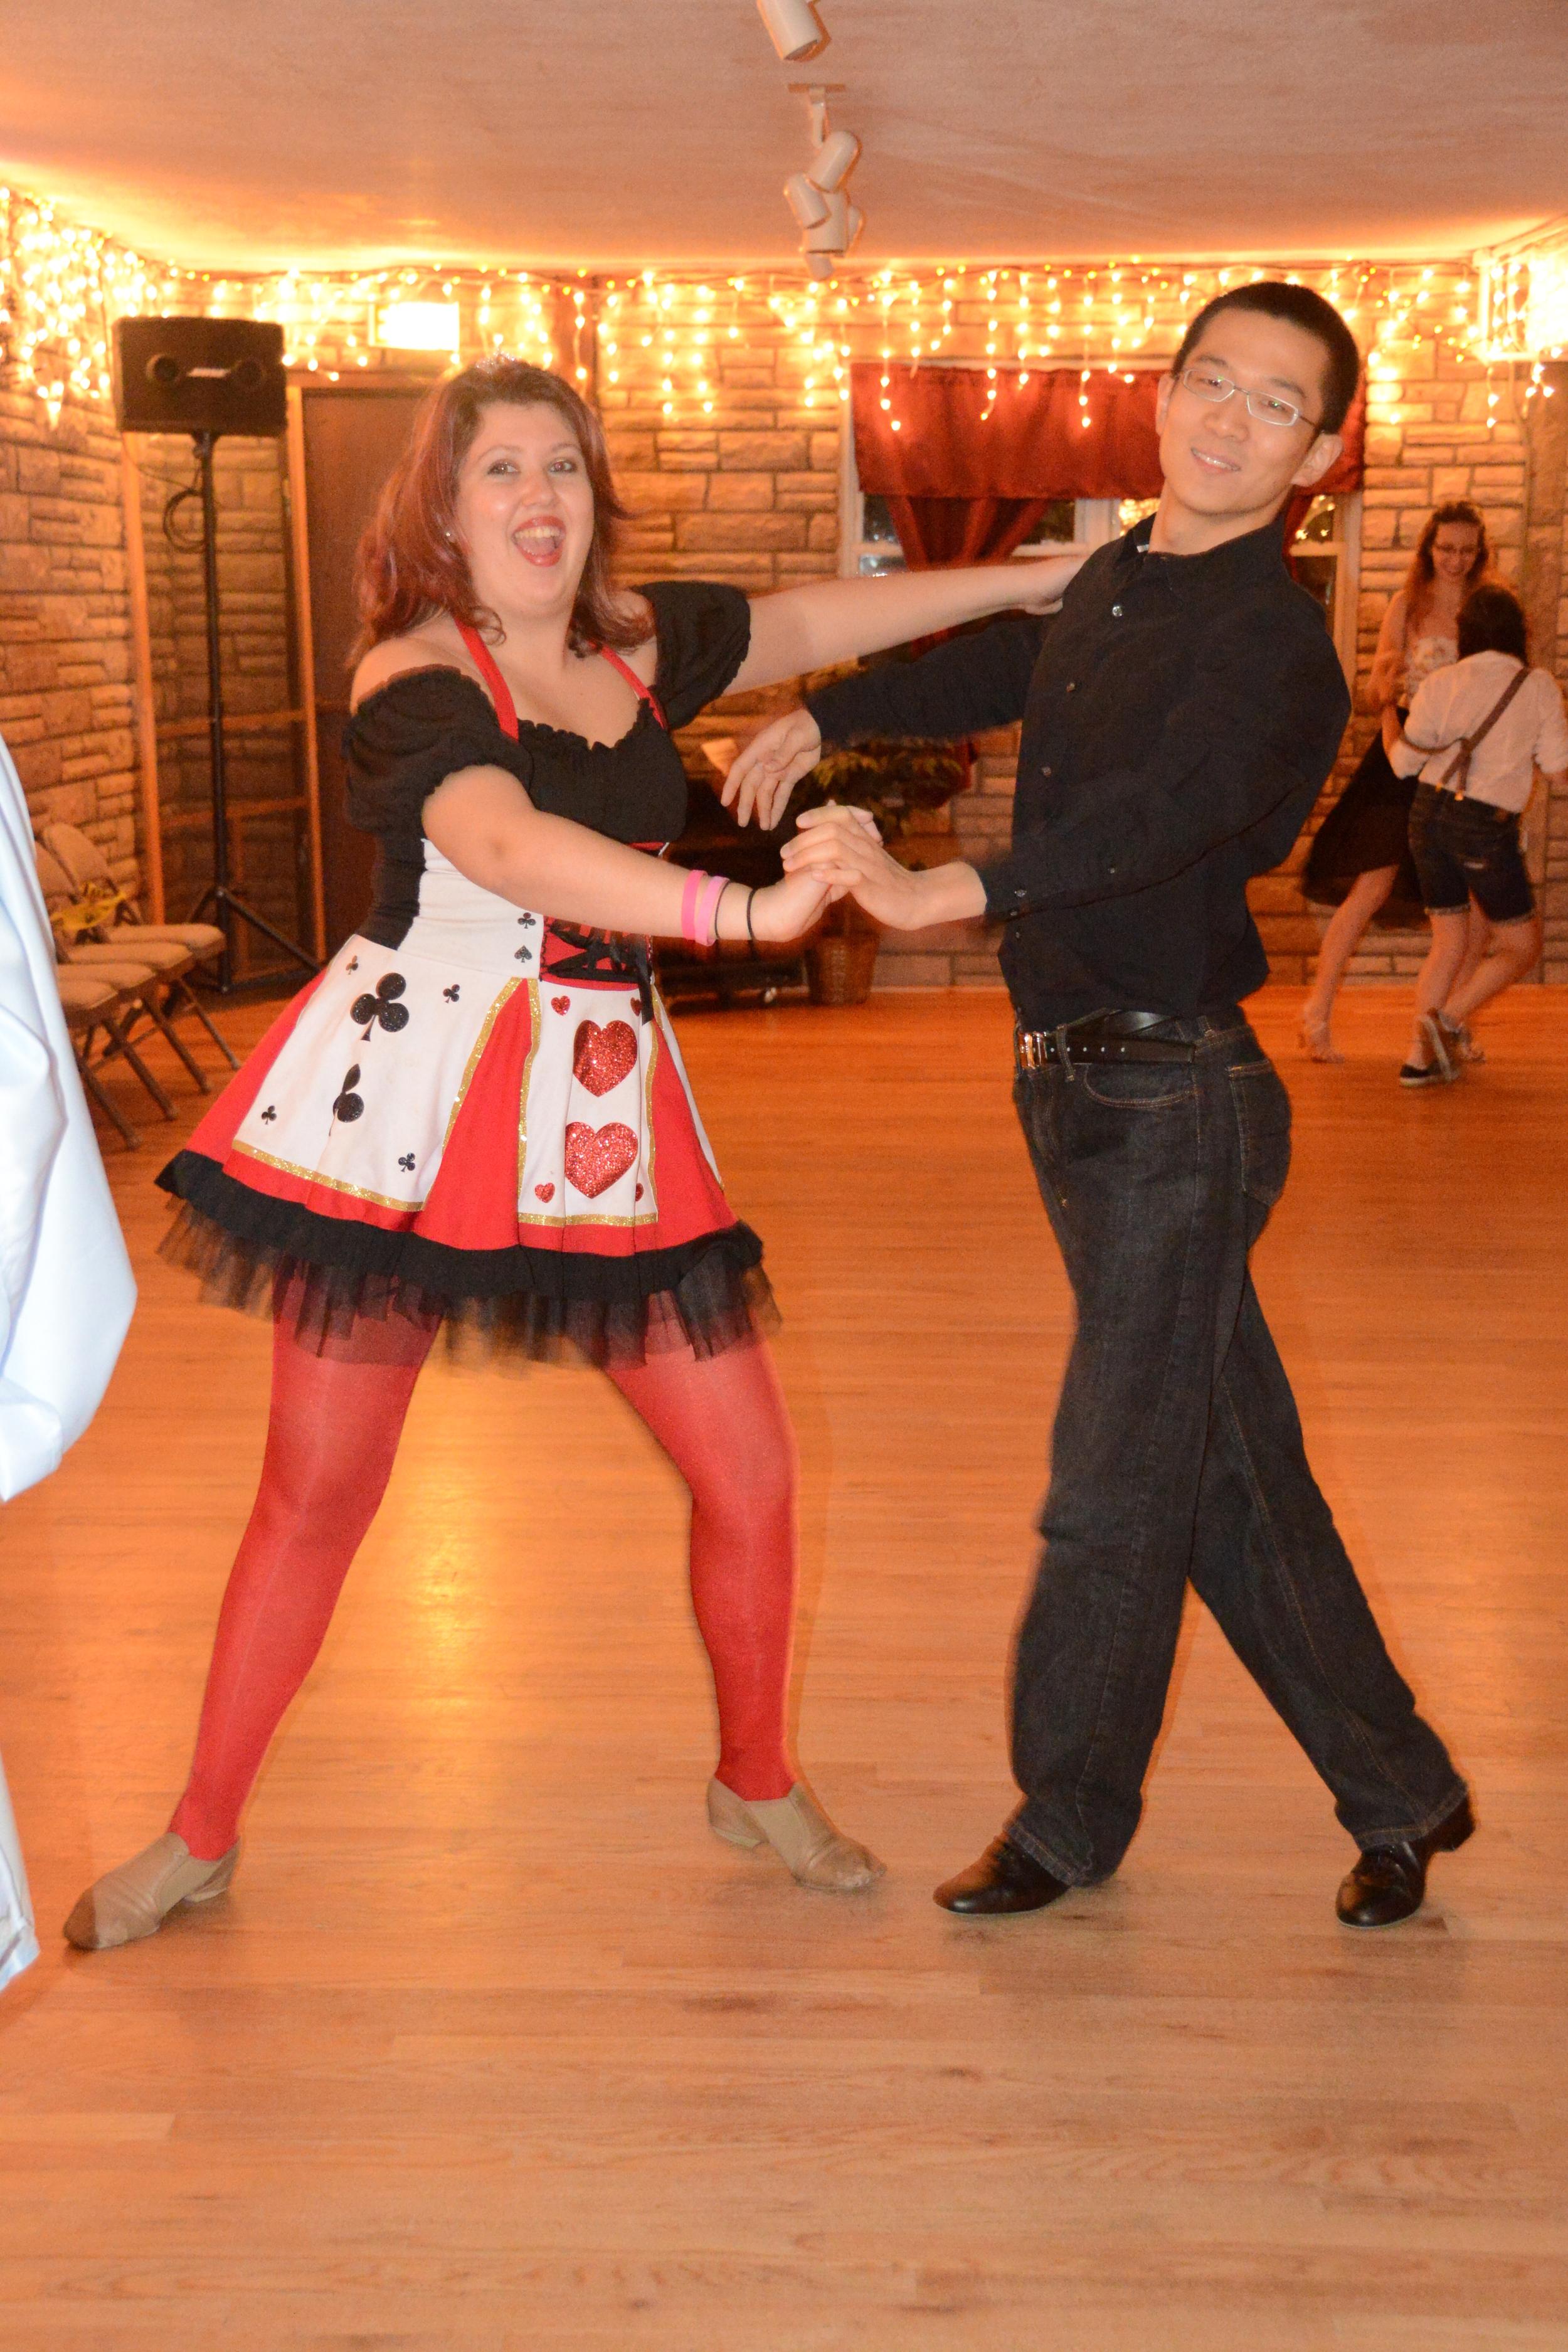 2012 10-27 Dance Magic Halloween party (10).JPG